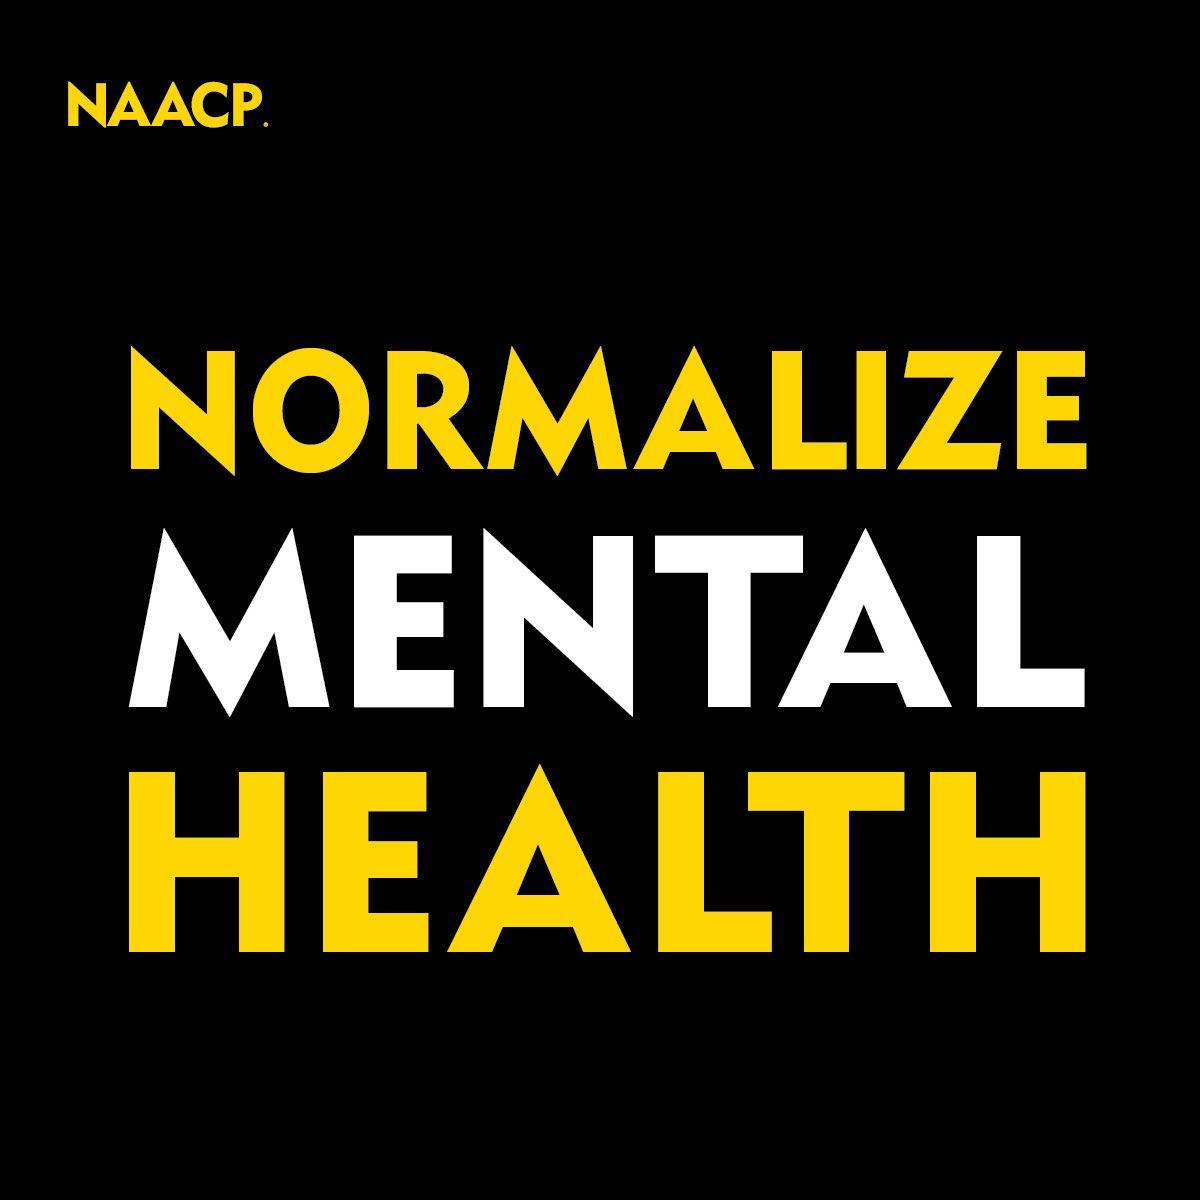 #MinorityMentalHealthMonth #MentalHealth365 https://t.co/OHm0oqZ1xO